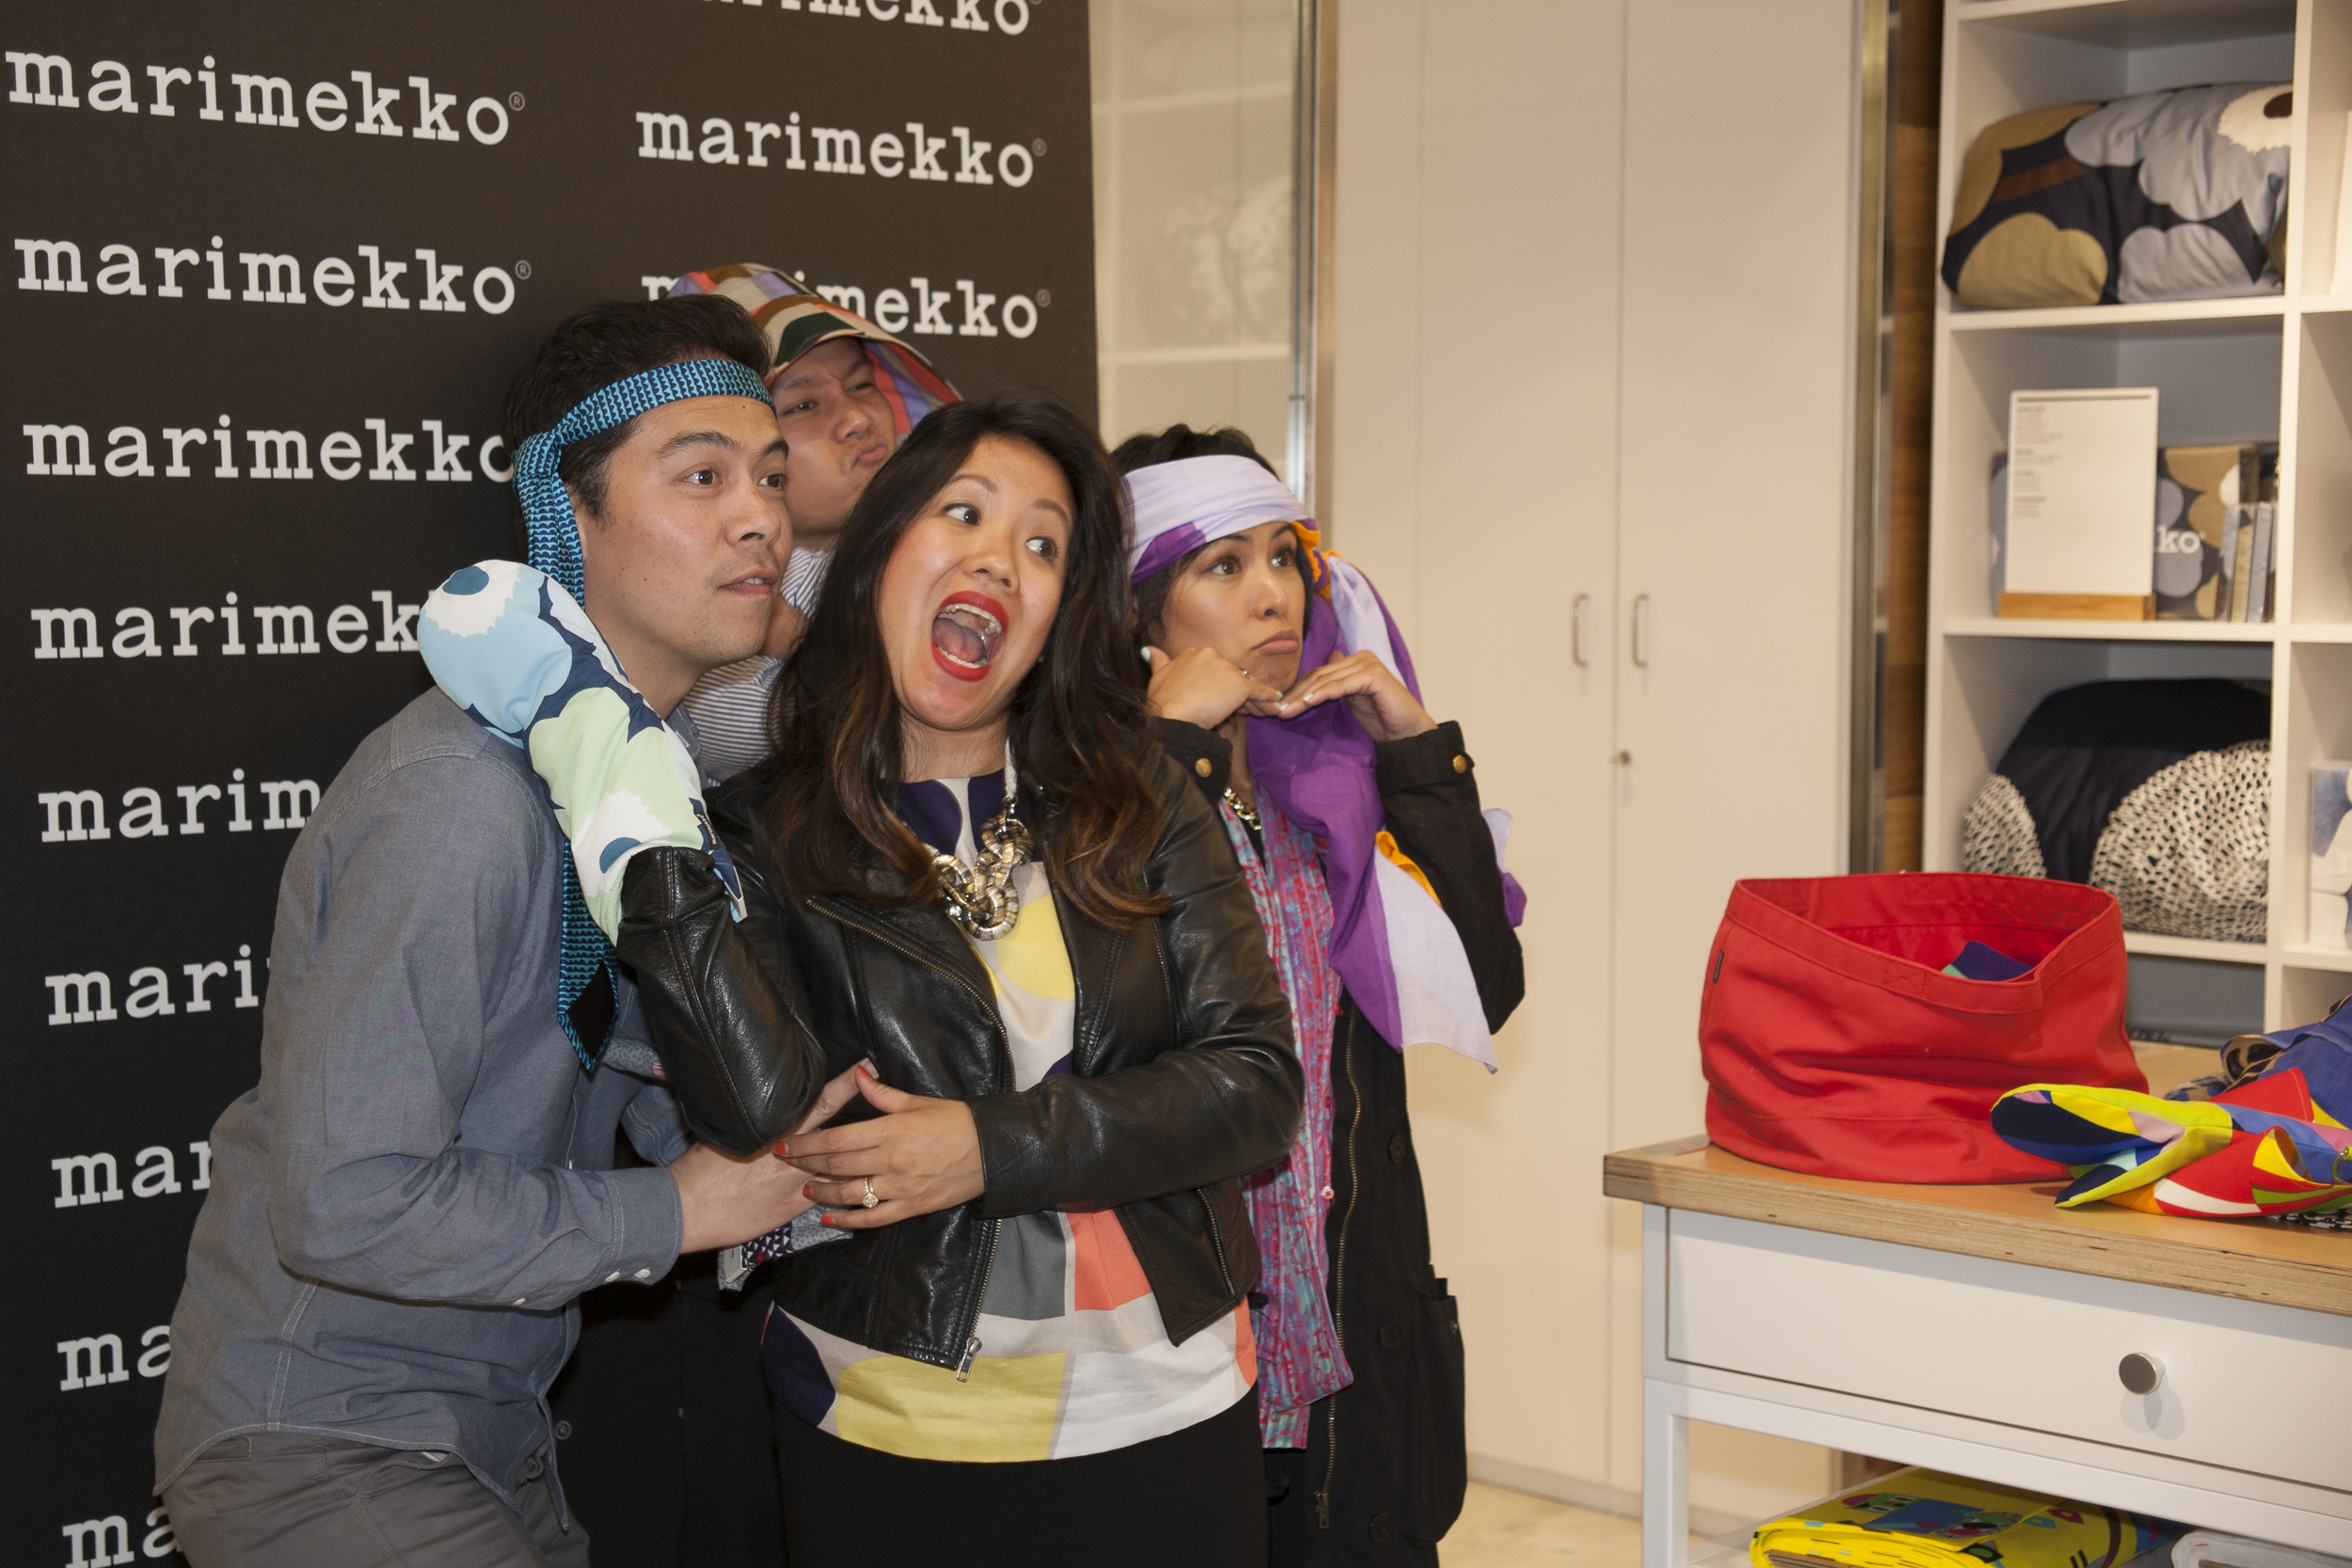 Marimekko_BH_Apr4-0546.jpg